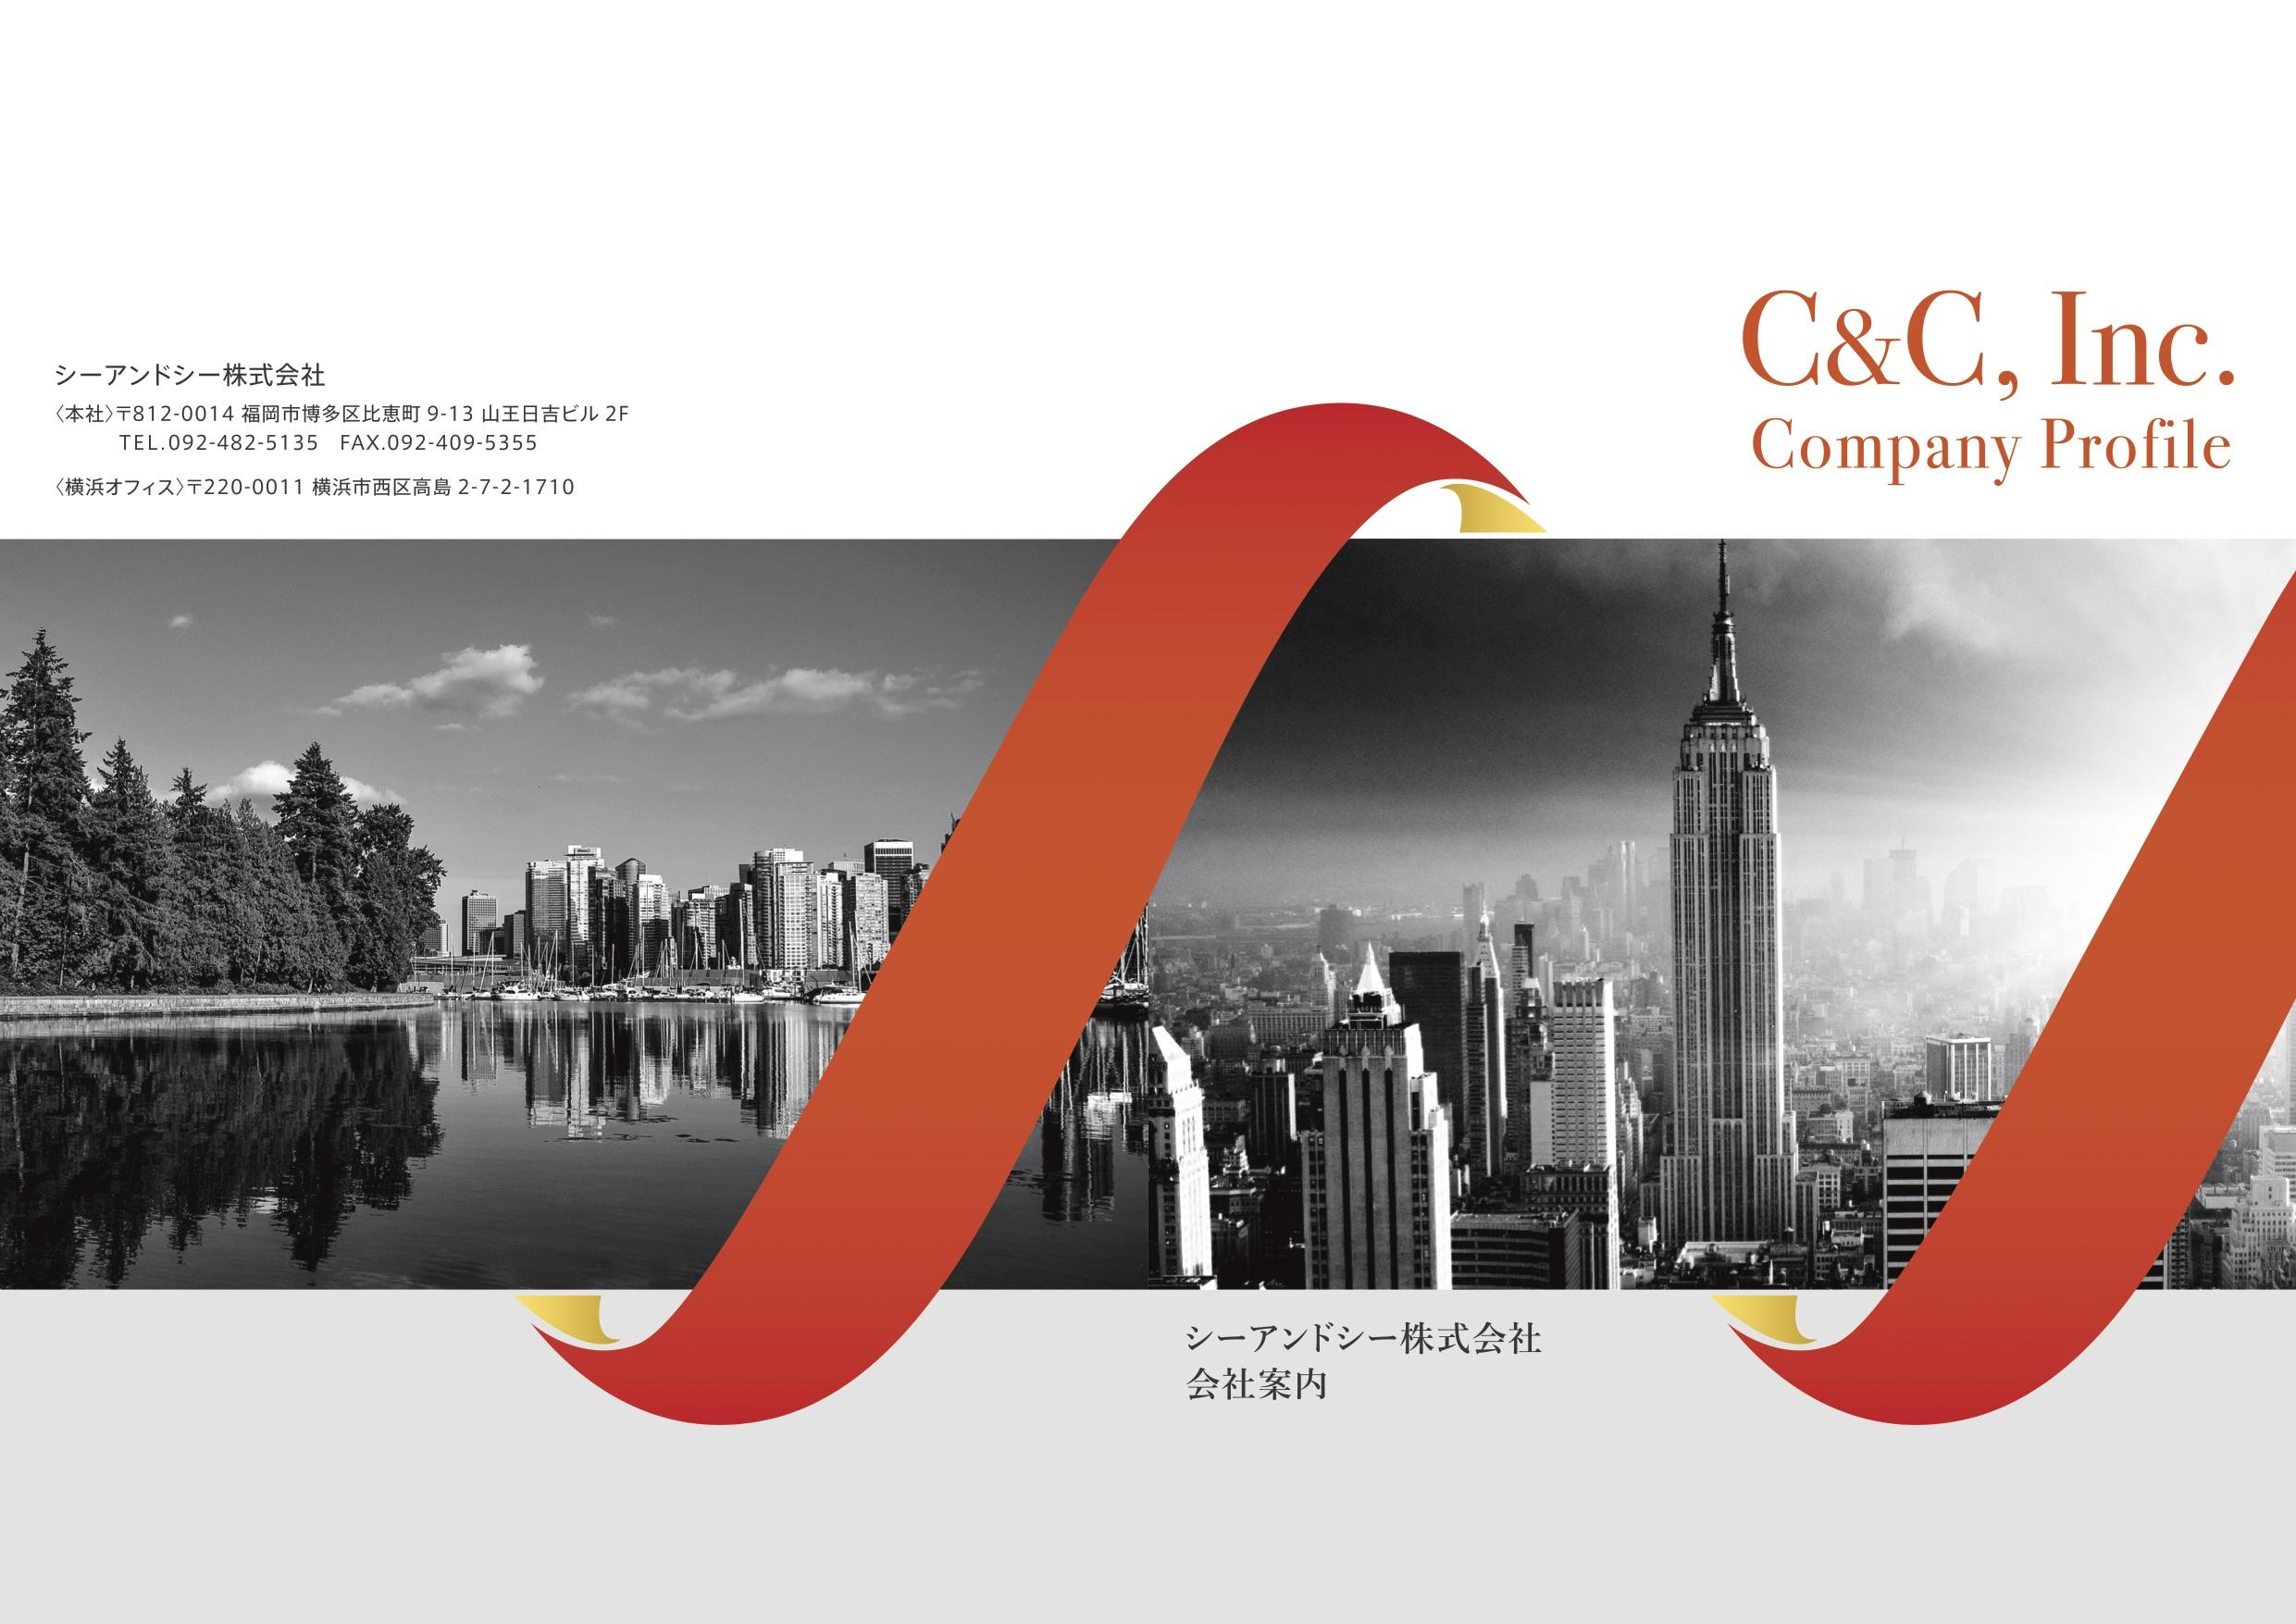 C&C_CompanyProfile2020_A4_8p_ol_0910_1